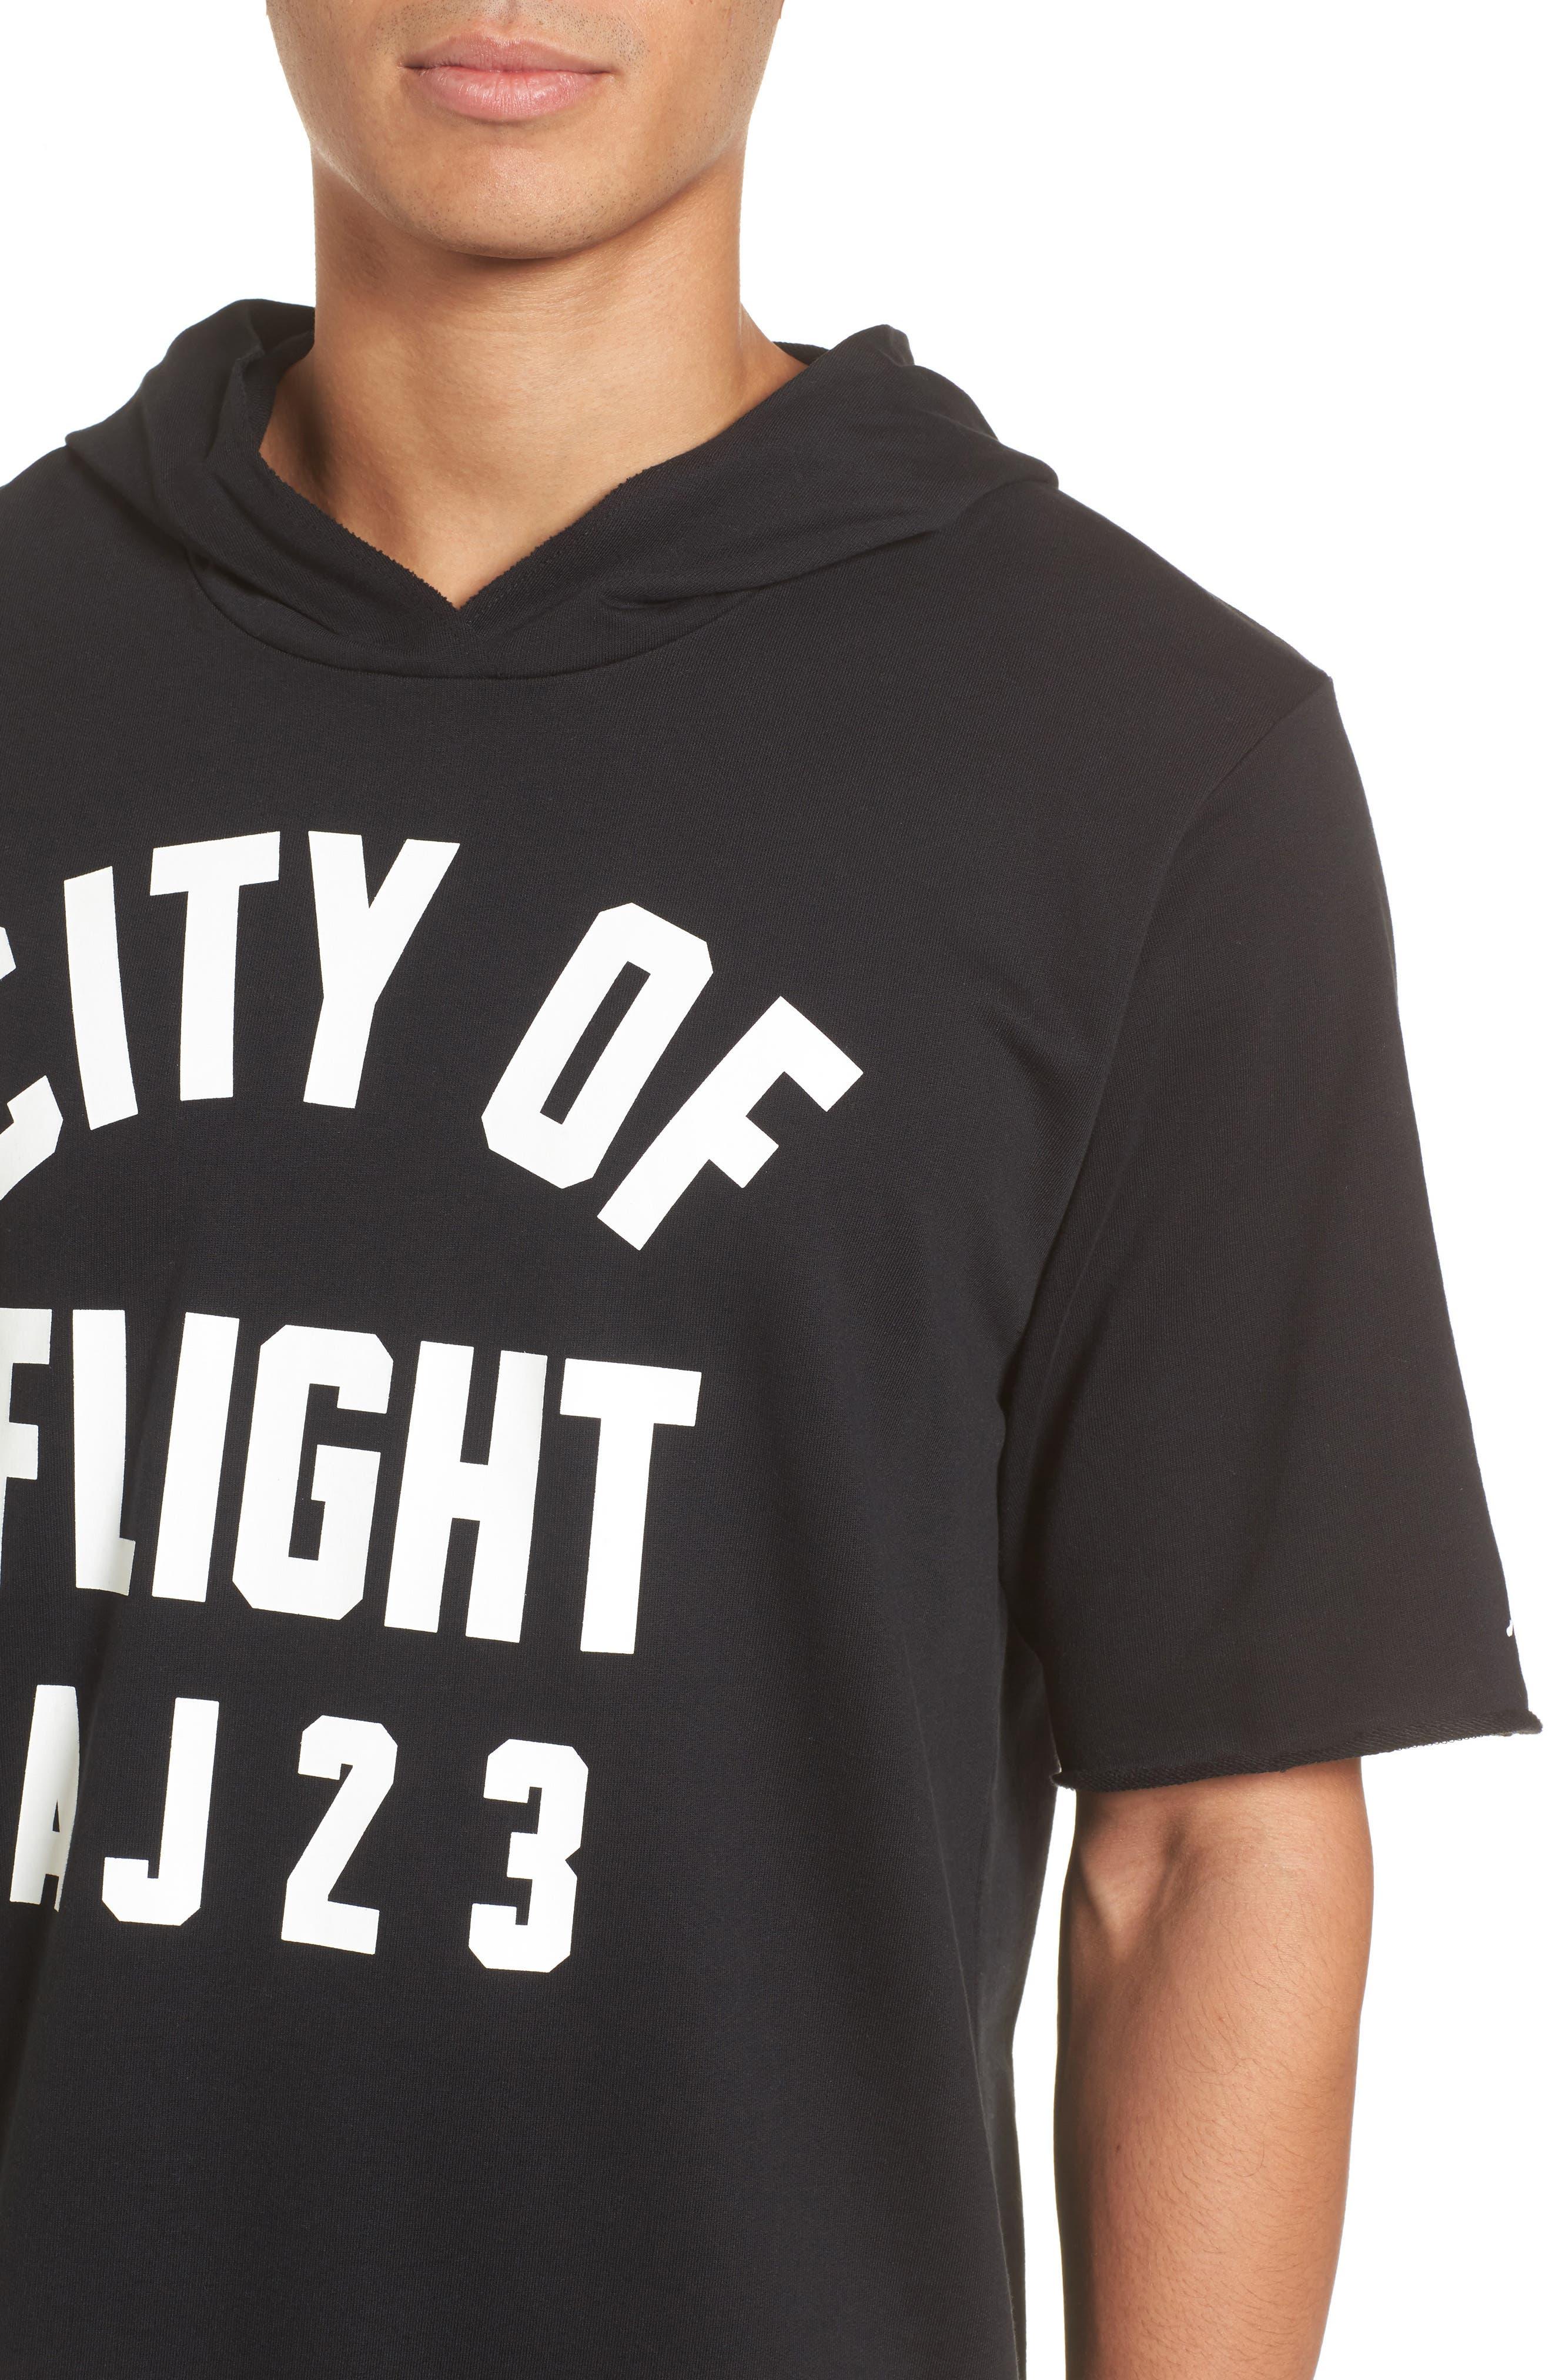 Sportswear City of Flight Hooded T-Shirt,                             Alternate thumbnail 4, color,                             Black/ White